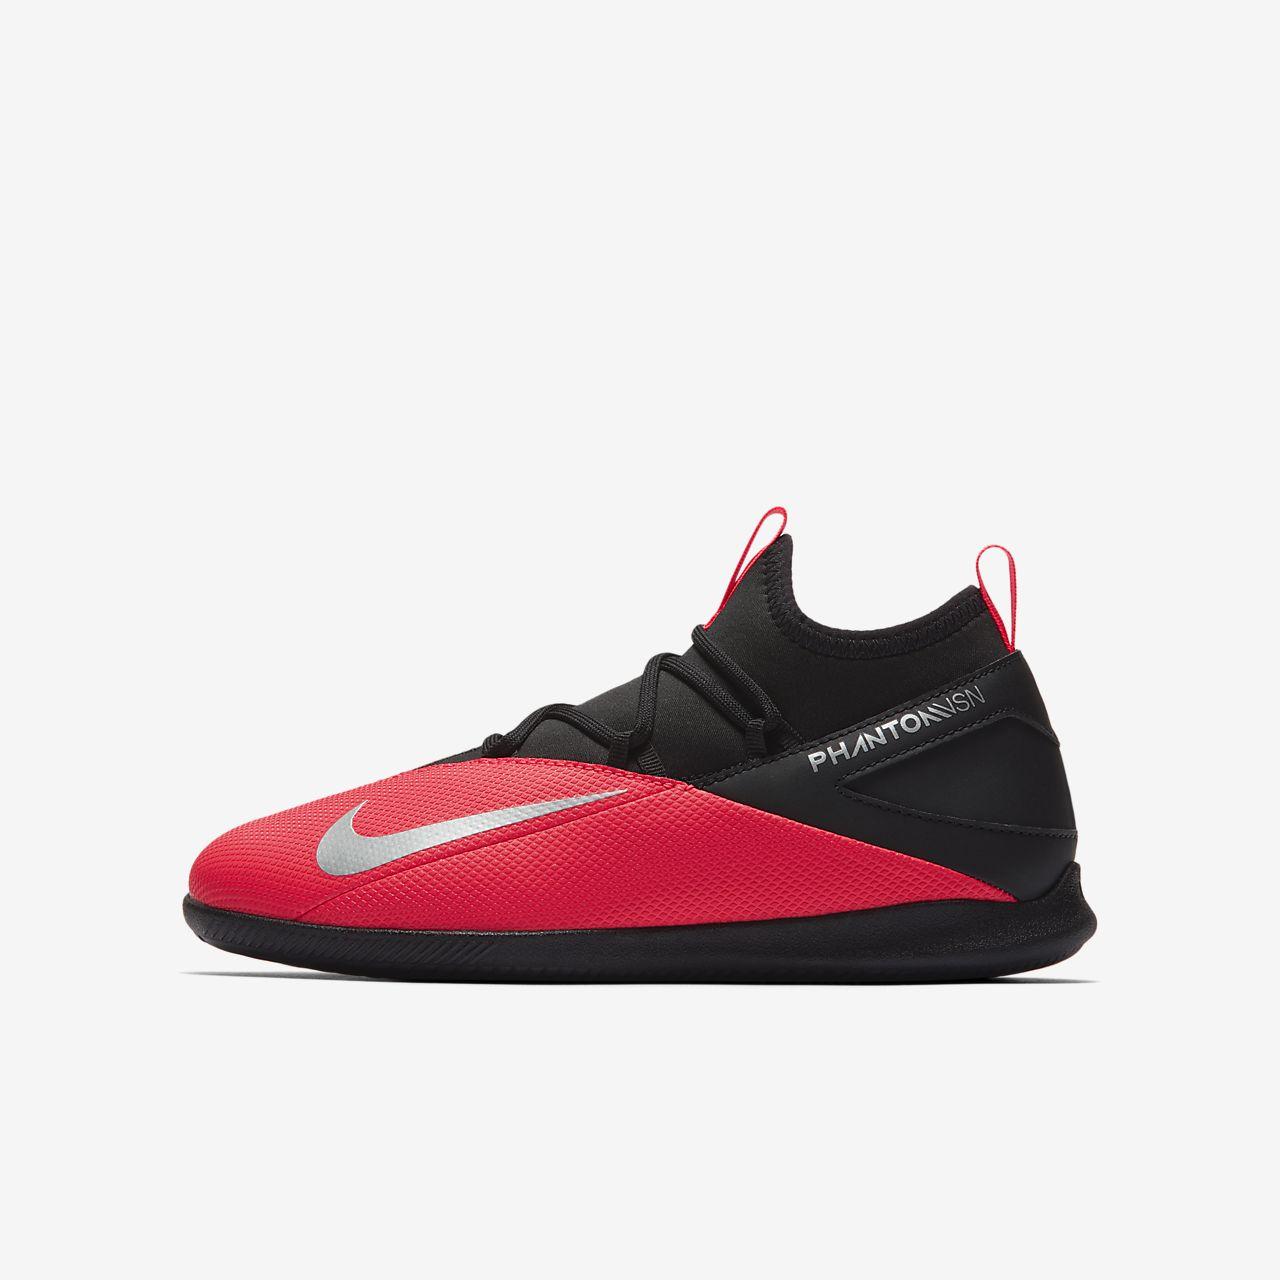 chaussure foot salle nike phantom